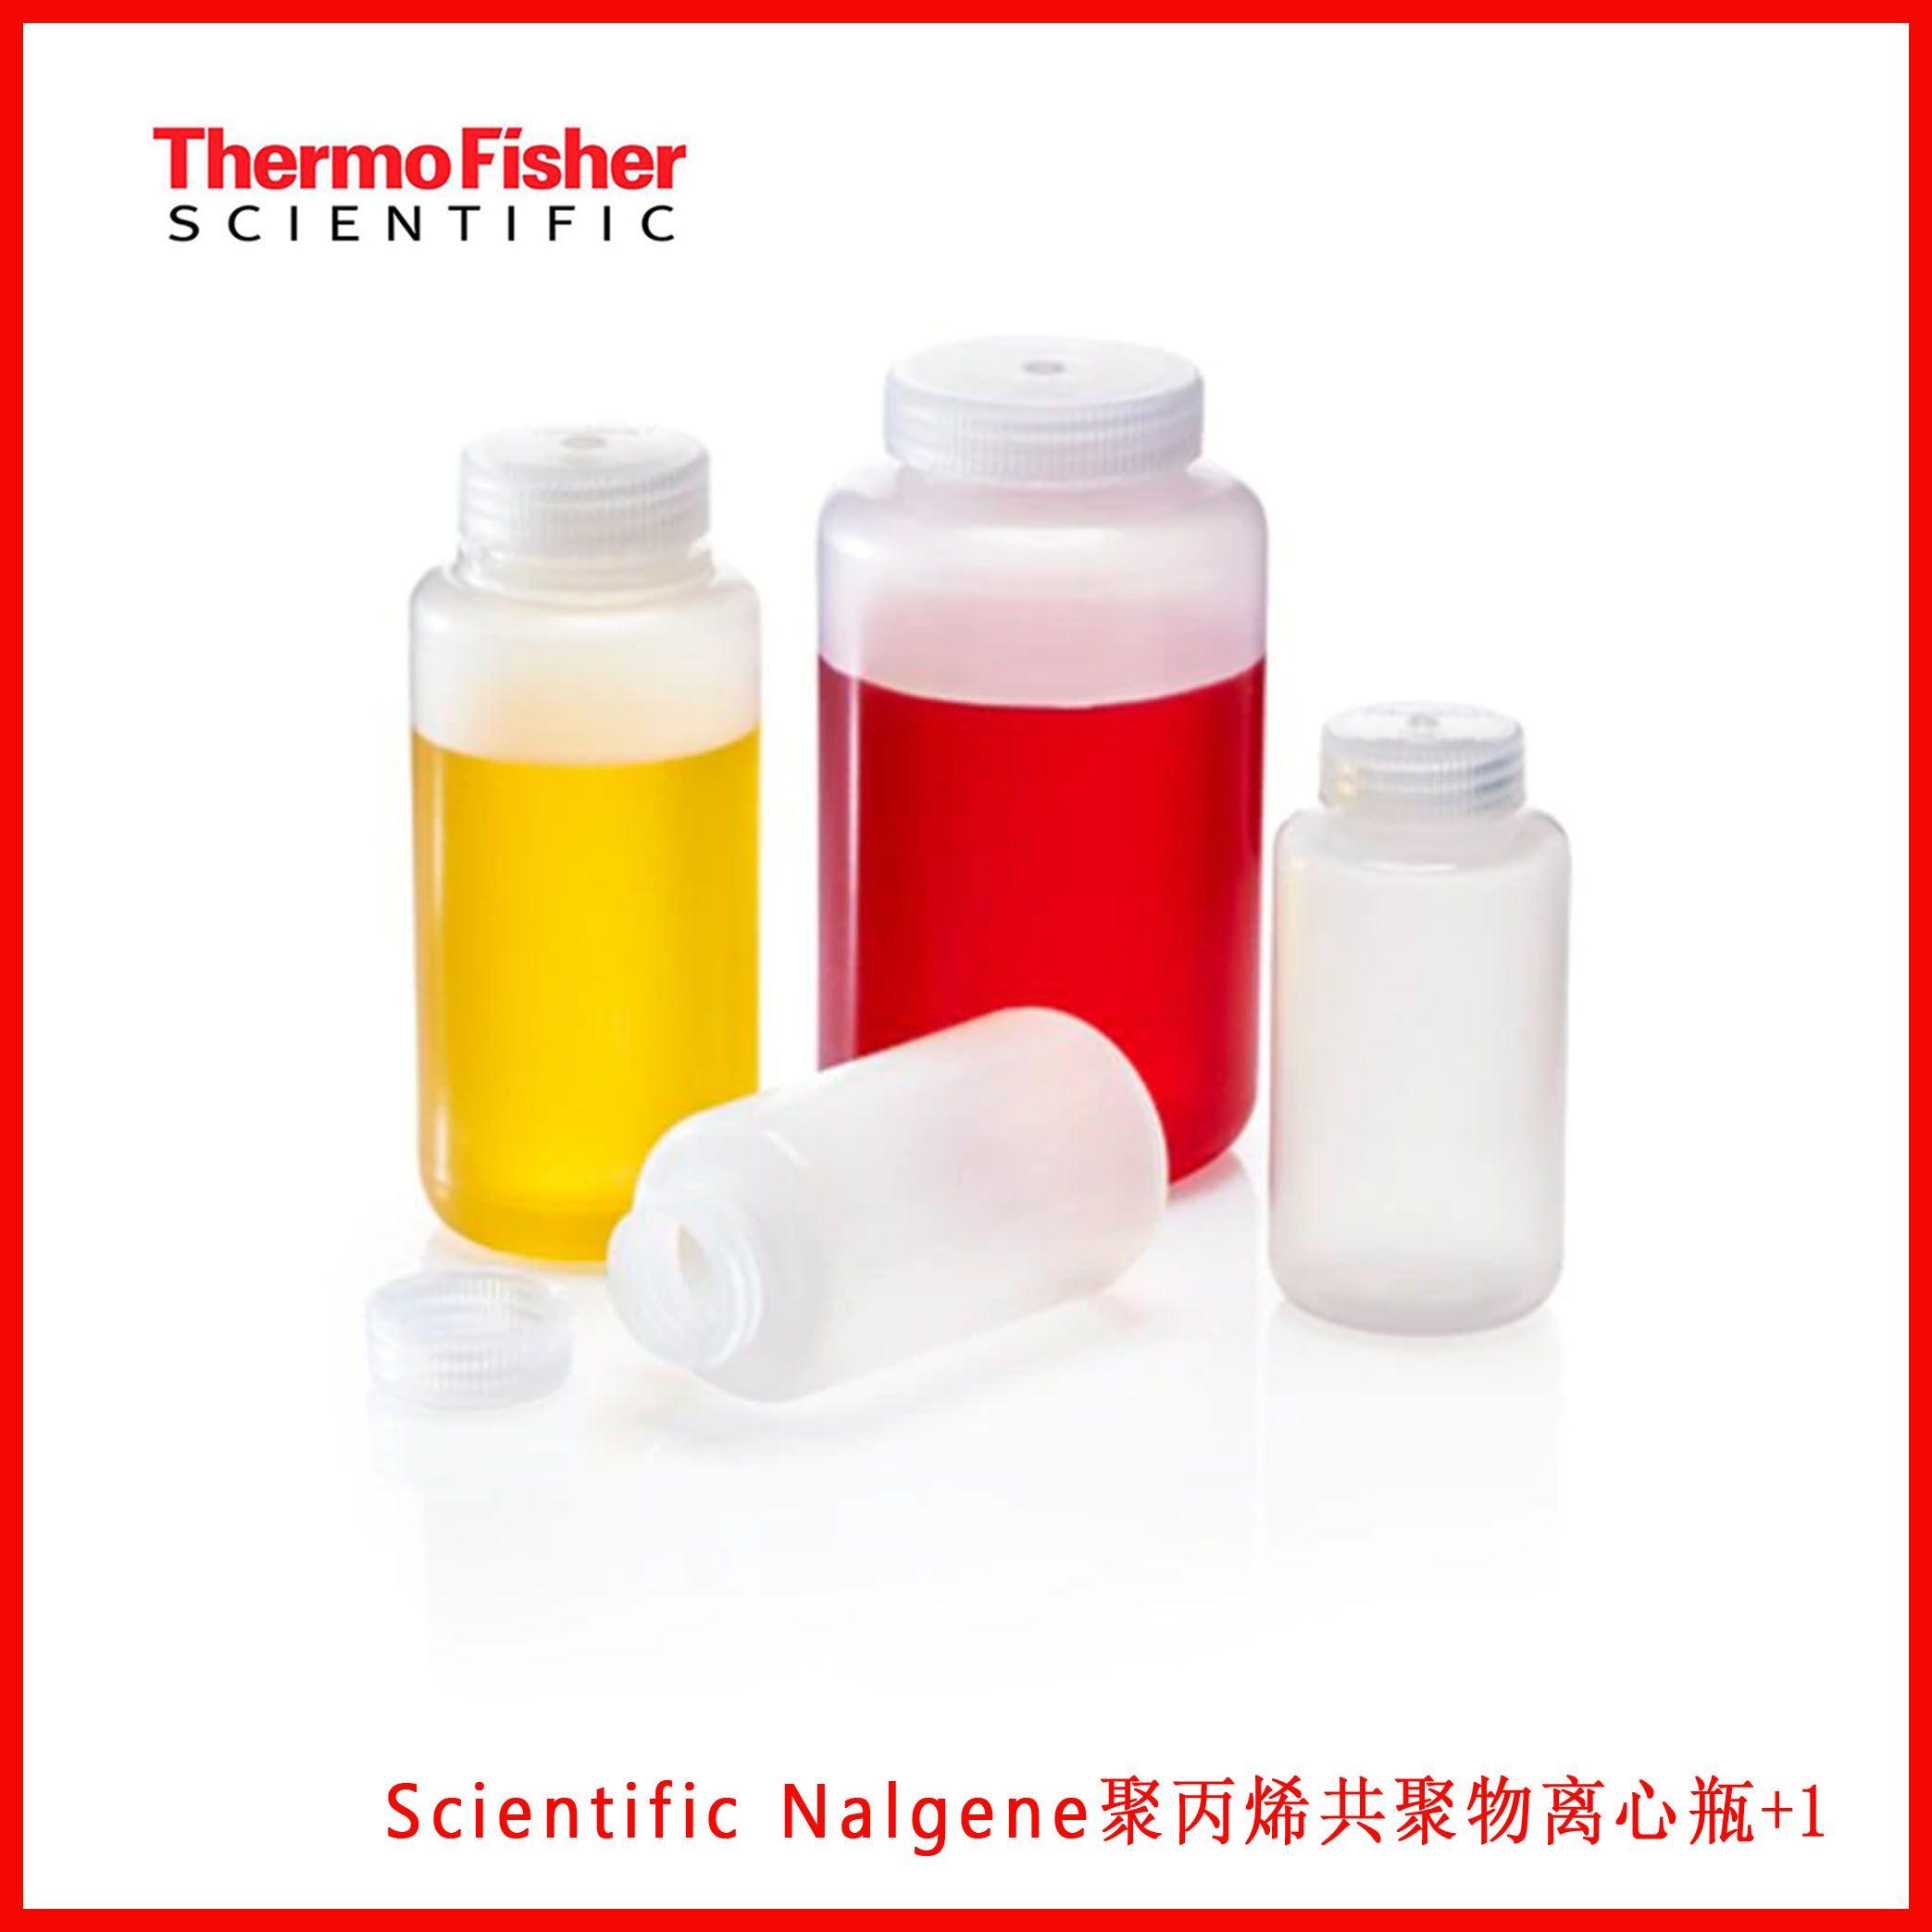 Thermo Scientific Nalgene聚丙烯共聚物离心瓶,PPCO,PC材质,现货